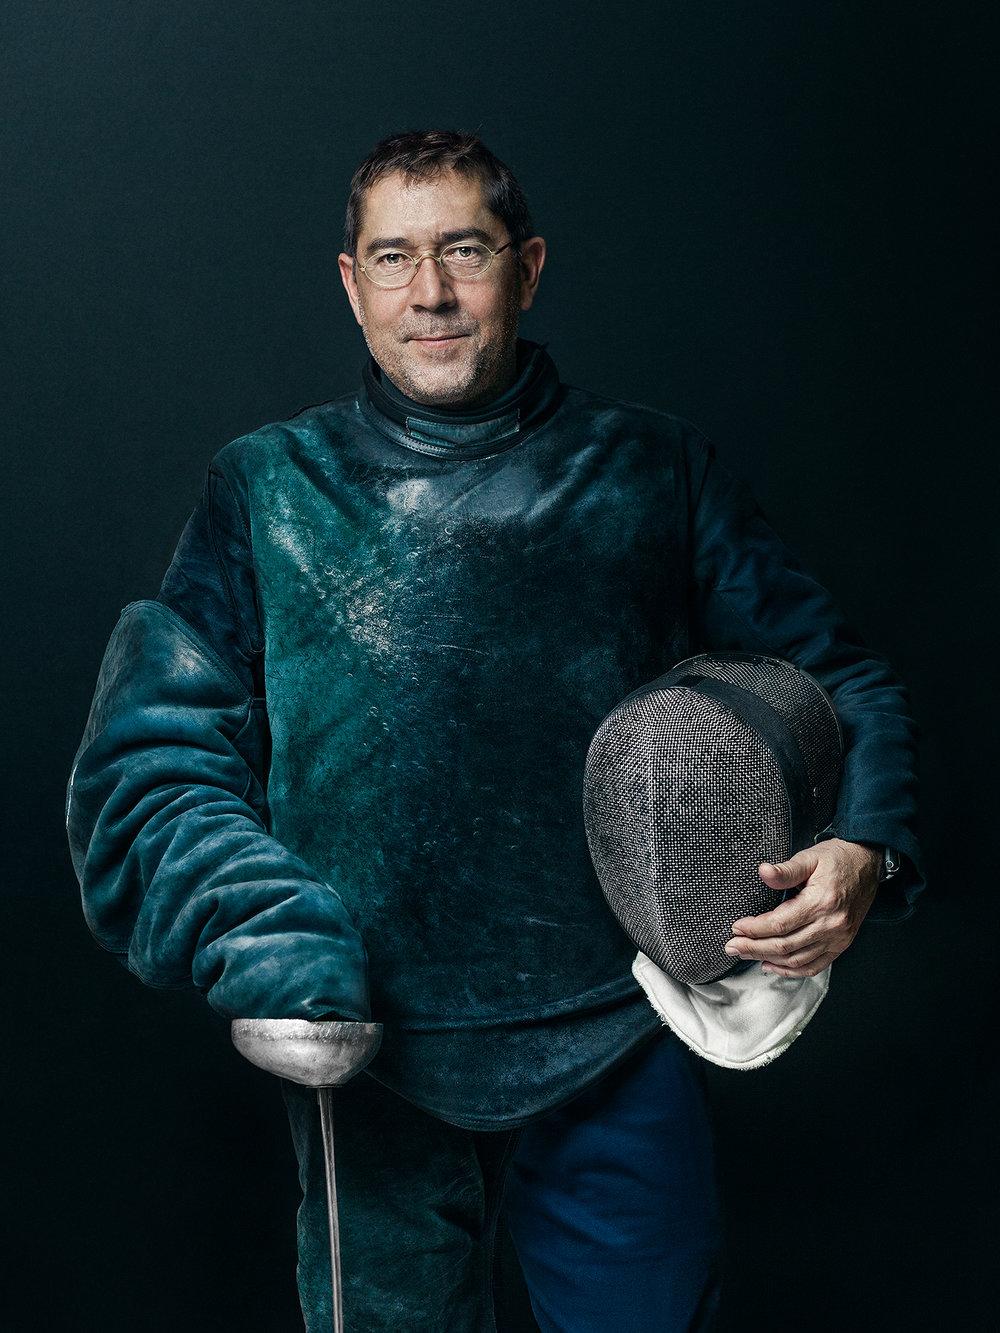 Oscar-arribas-esgrima-maestro-fencing-master-fencer-fechten-scherma-escrime-portrait-fotografo-retrato-photographer005.jpg